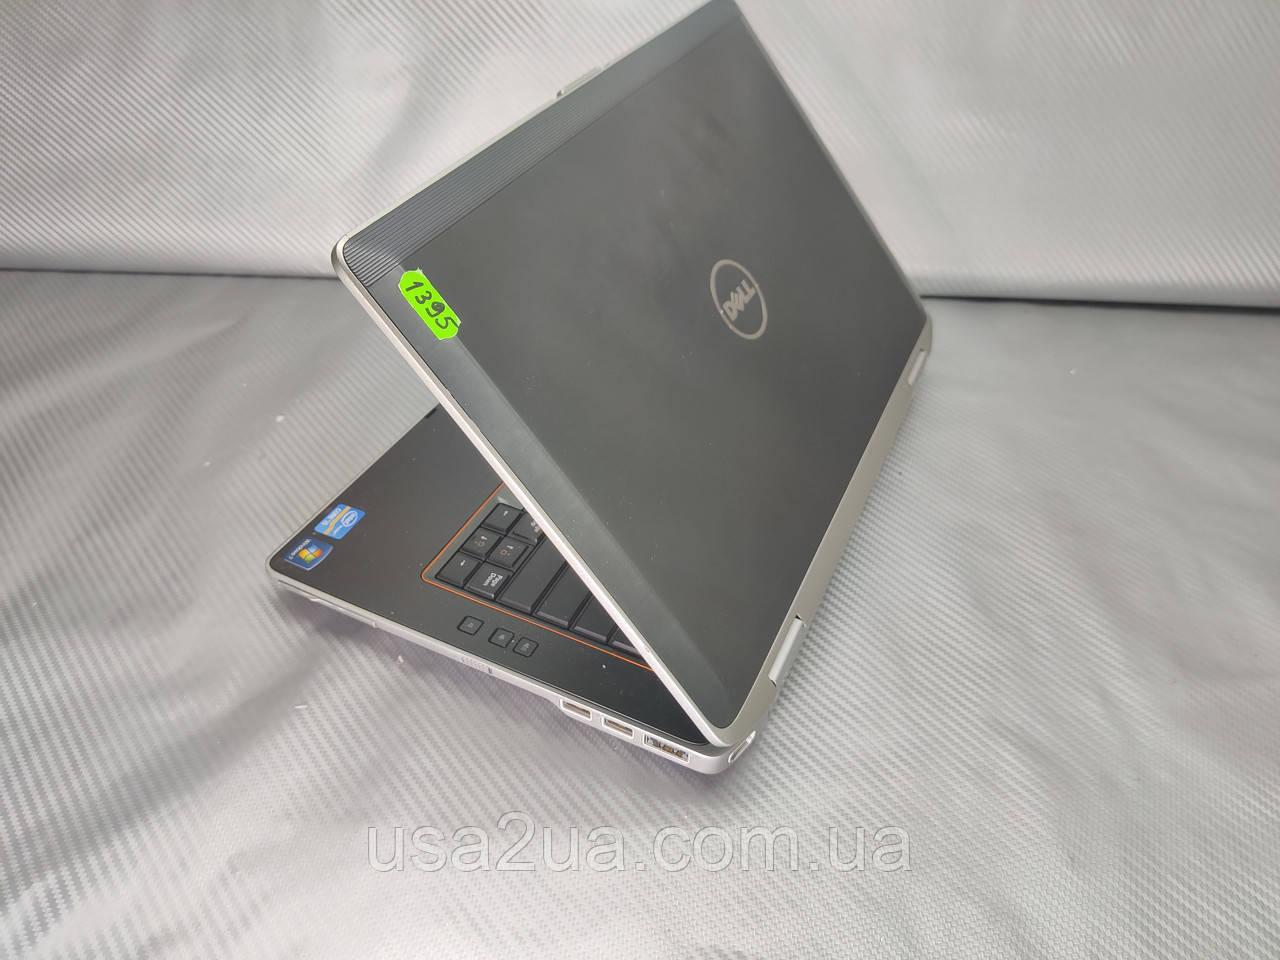 Ноутбук Dell Latitude E6420 Core I5 2Gen 4Gb 320Gb Без батареї Кредит Гарантія Доставка